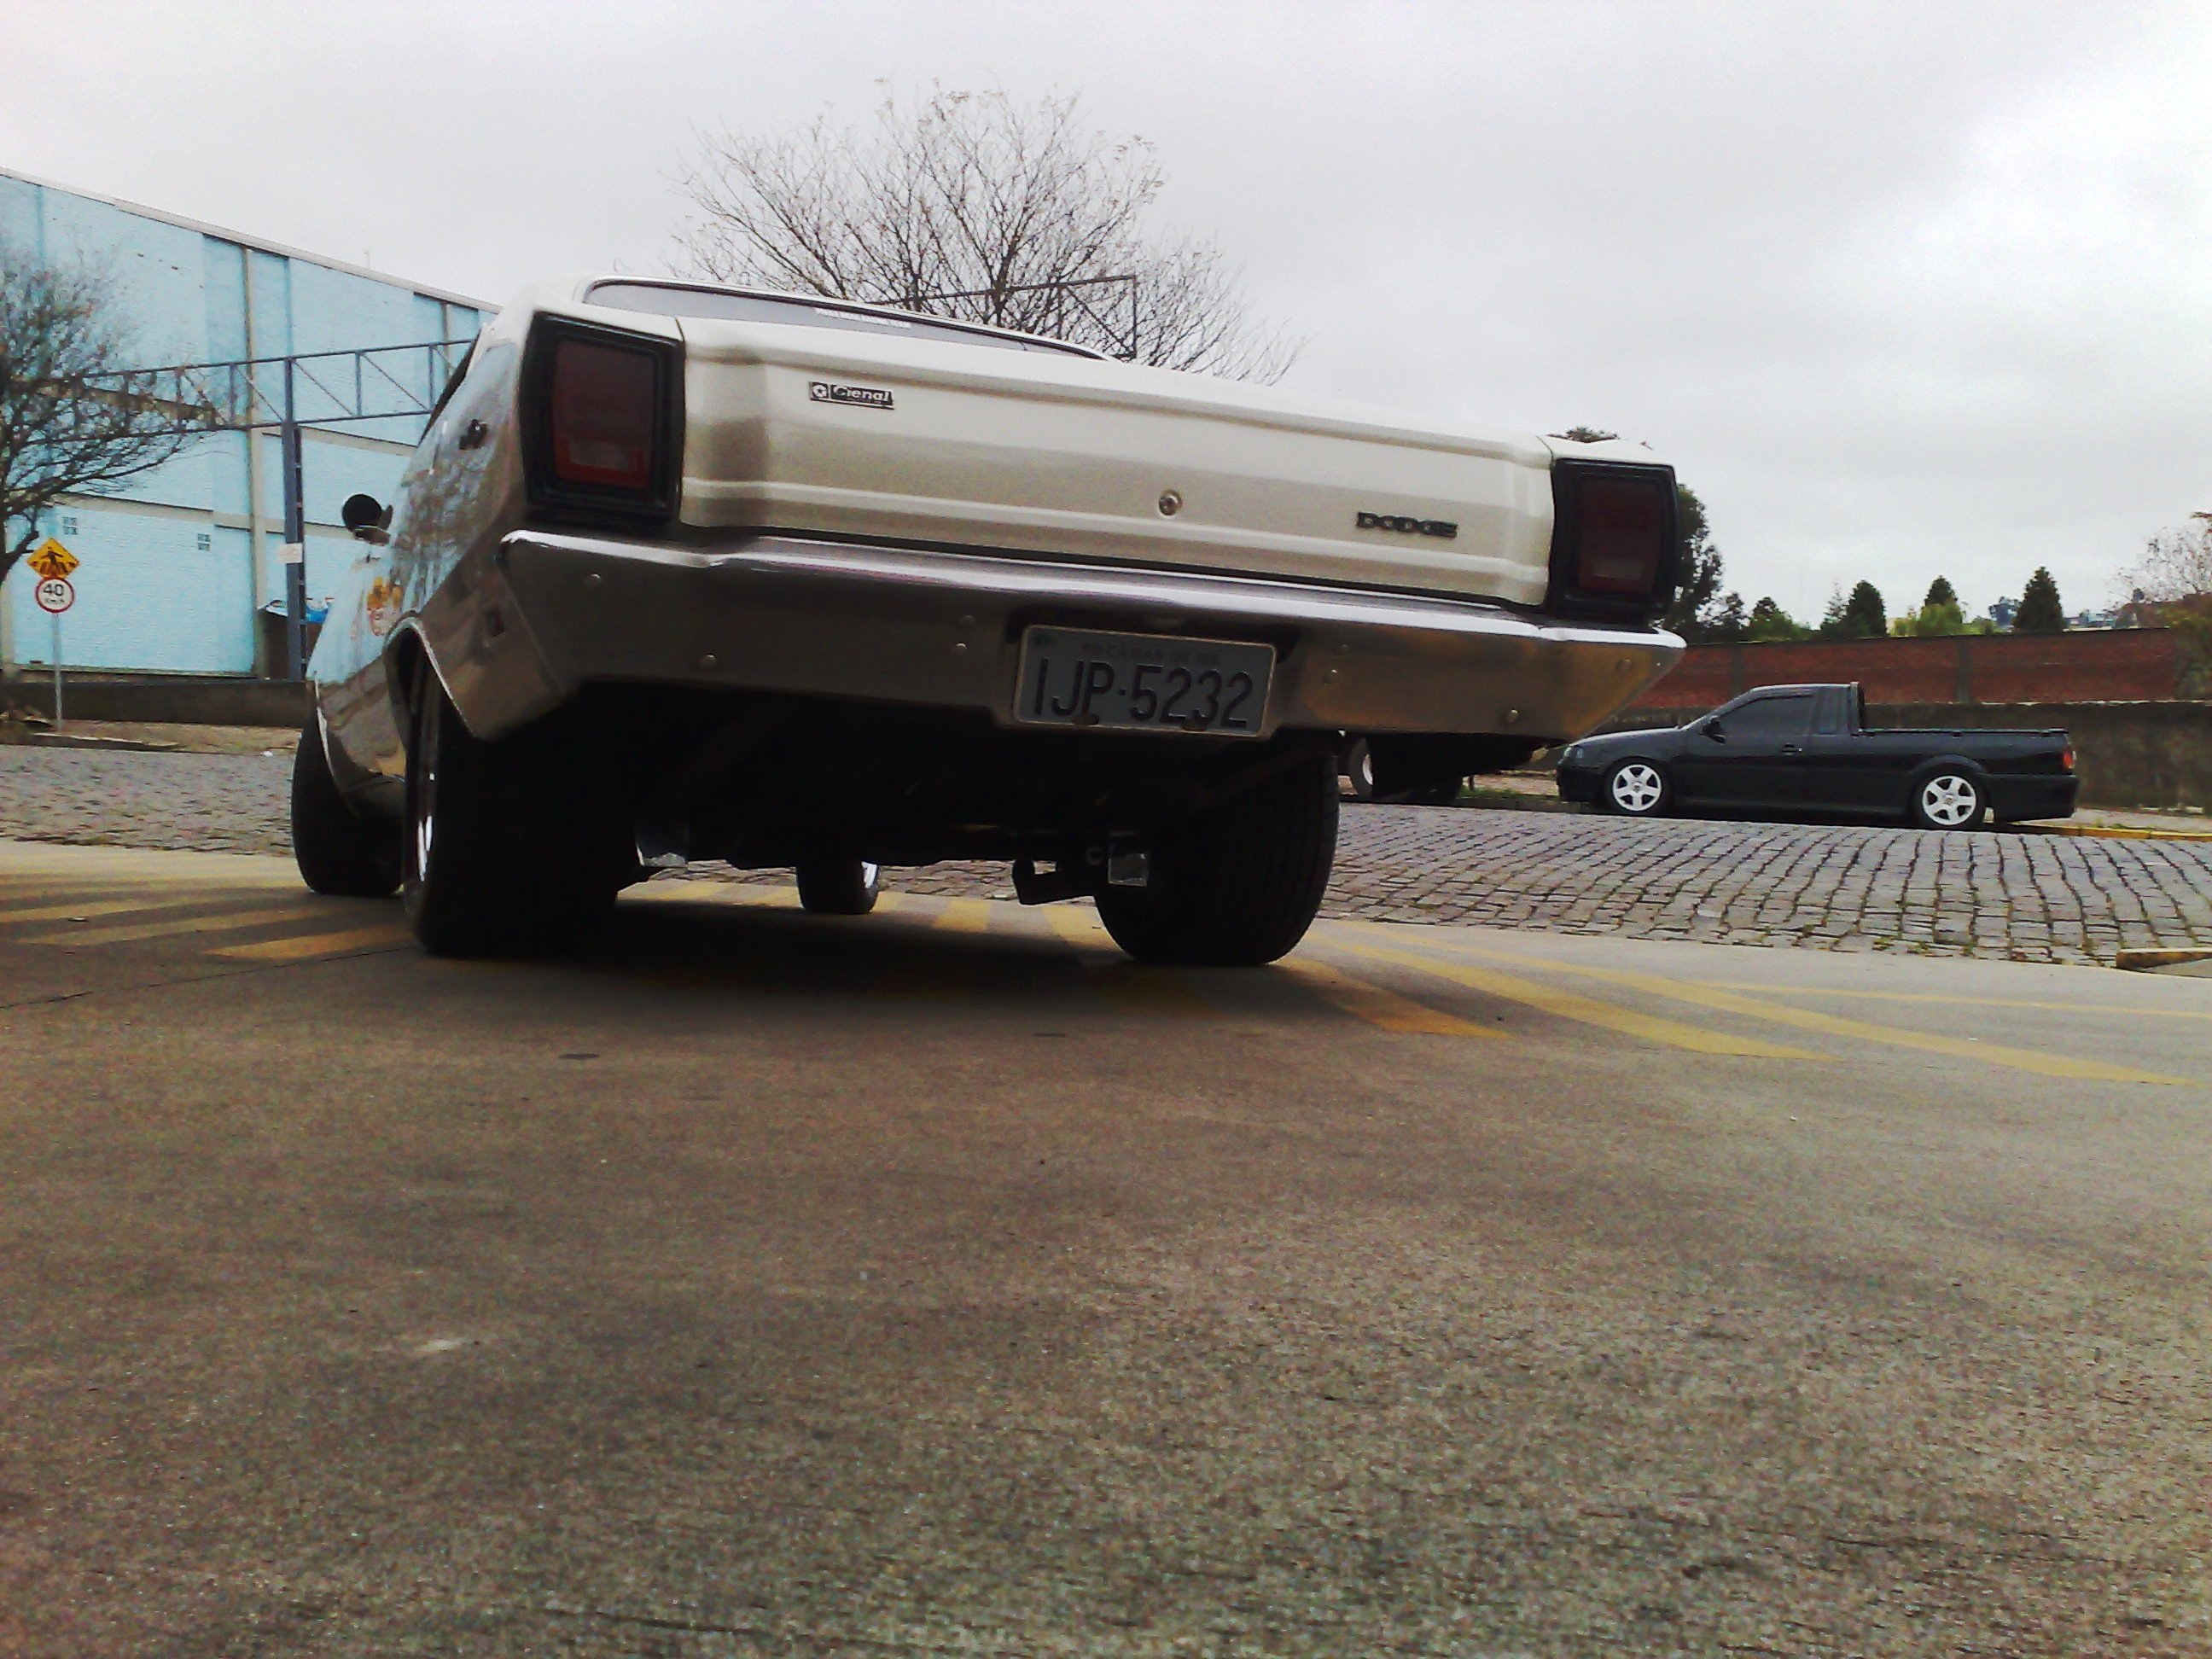 181020081341 Dodge Dart roubado!